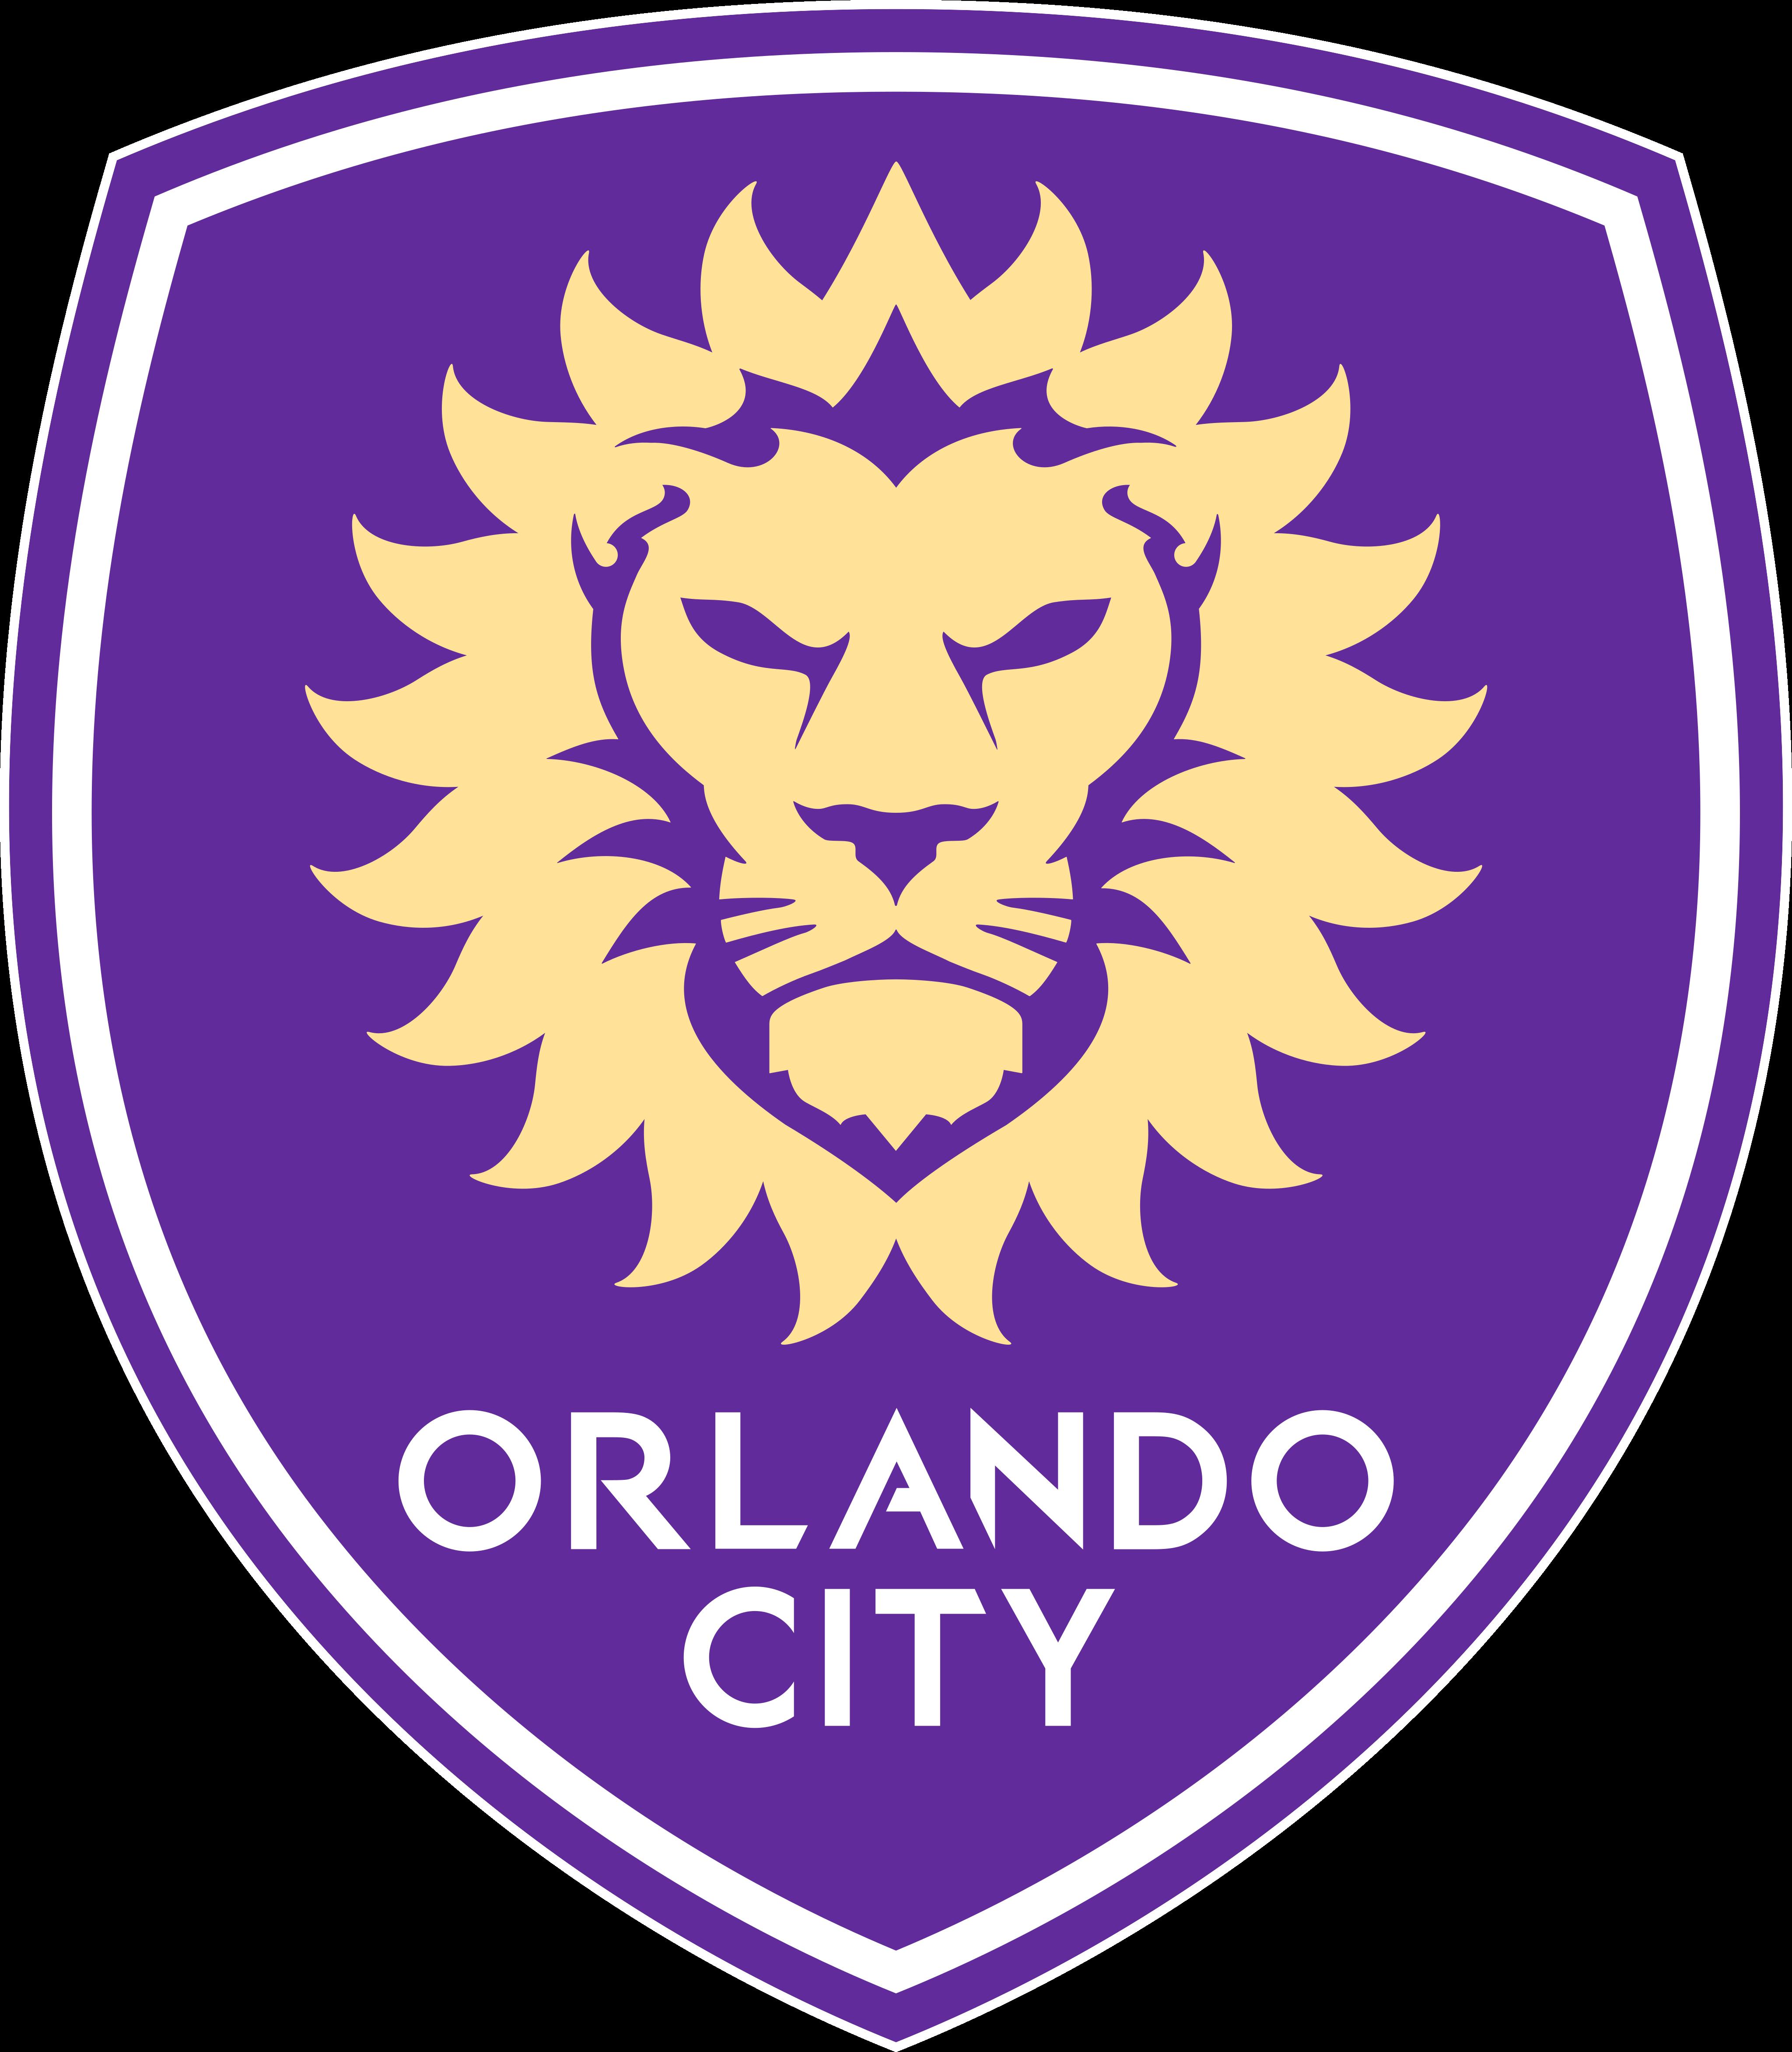 orlando city sc logo - Orlando City SC Logo